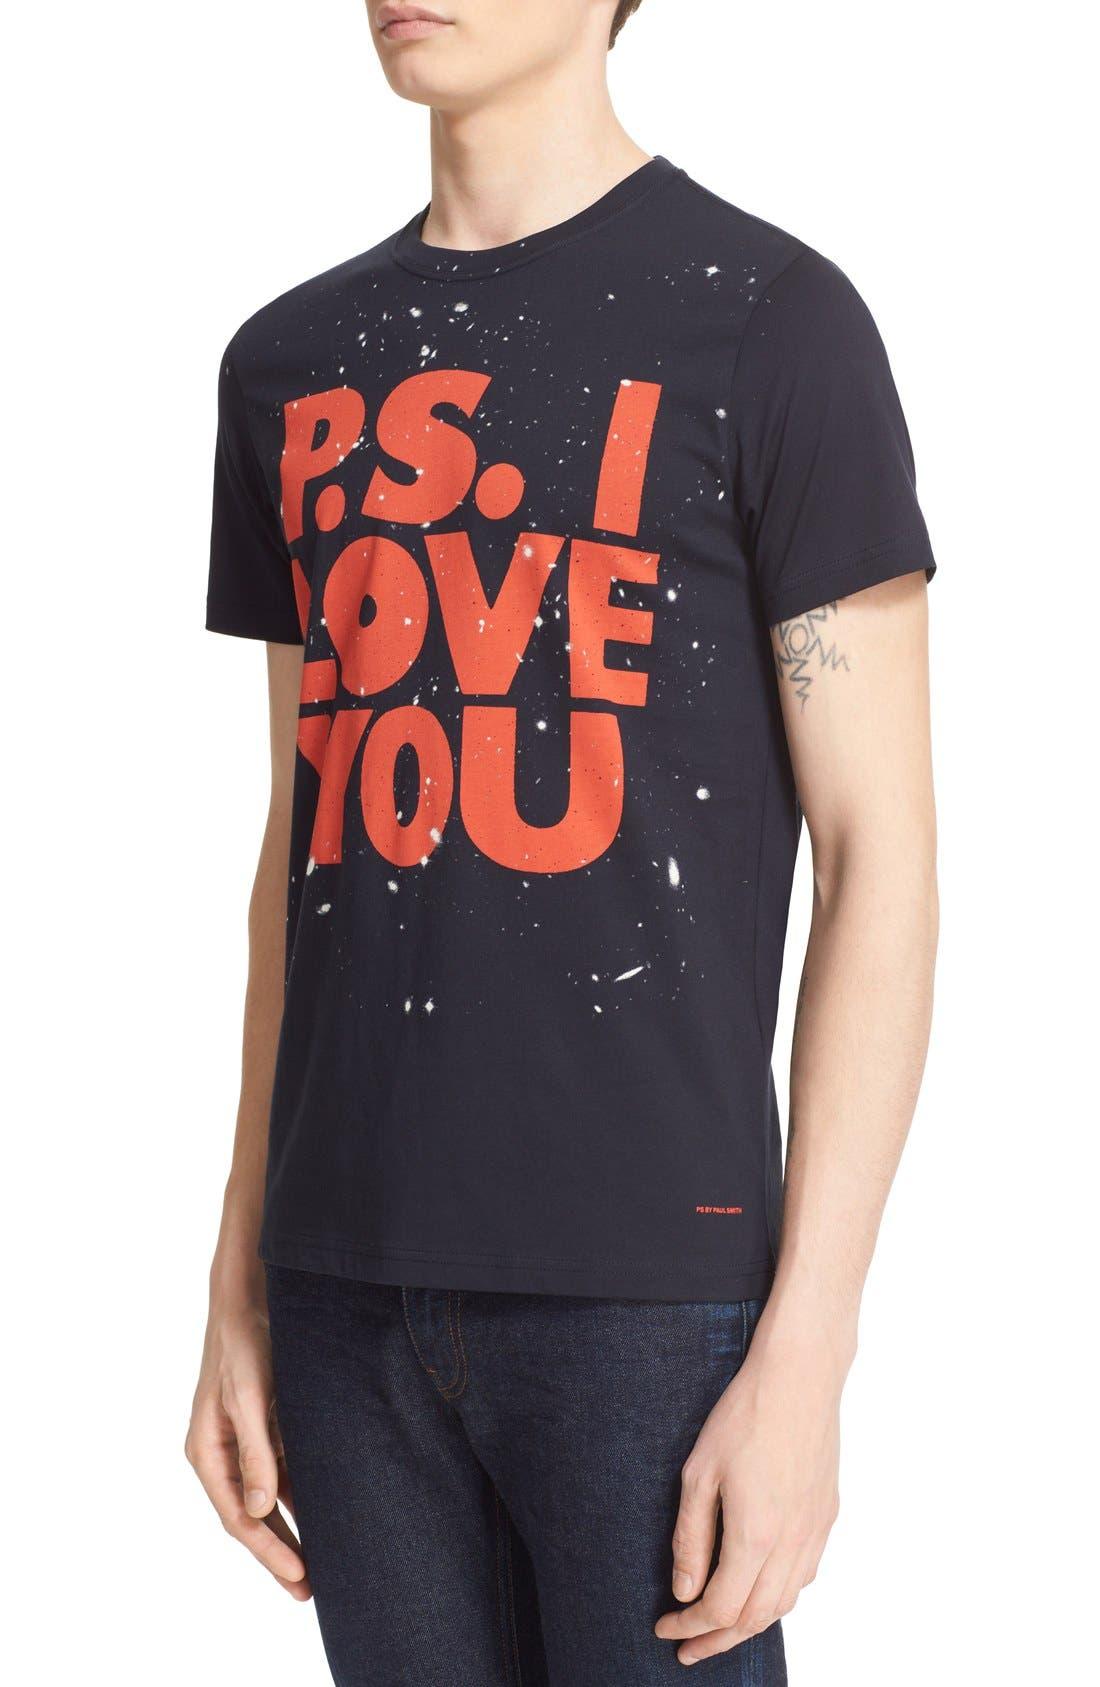 Paul Smith 'P.S. I Love You' Graphic Cotton T-Shirt,                             Alternate thumbnail 3, color,                             414